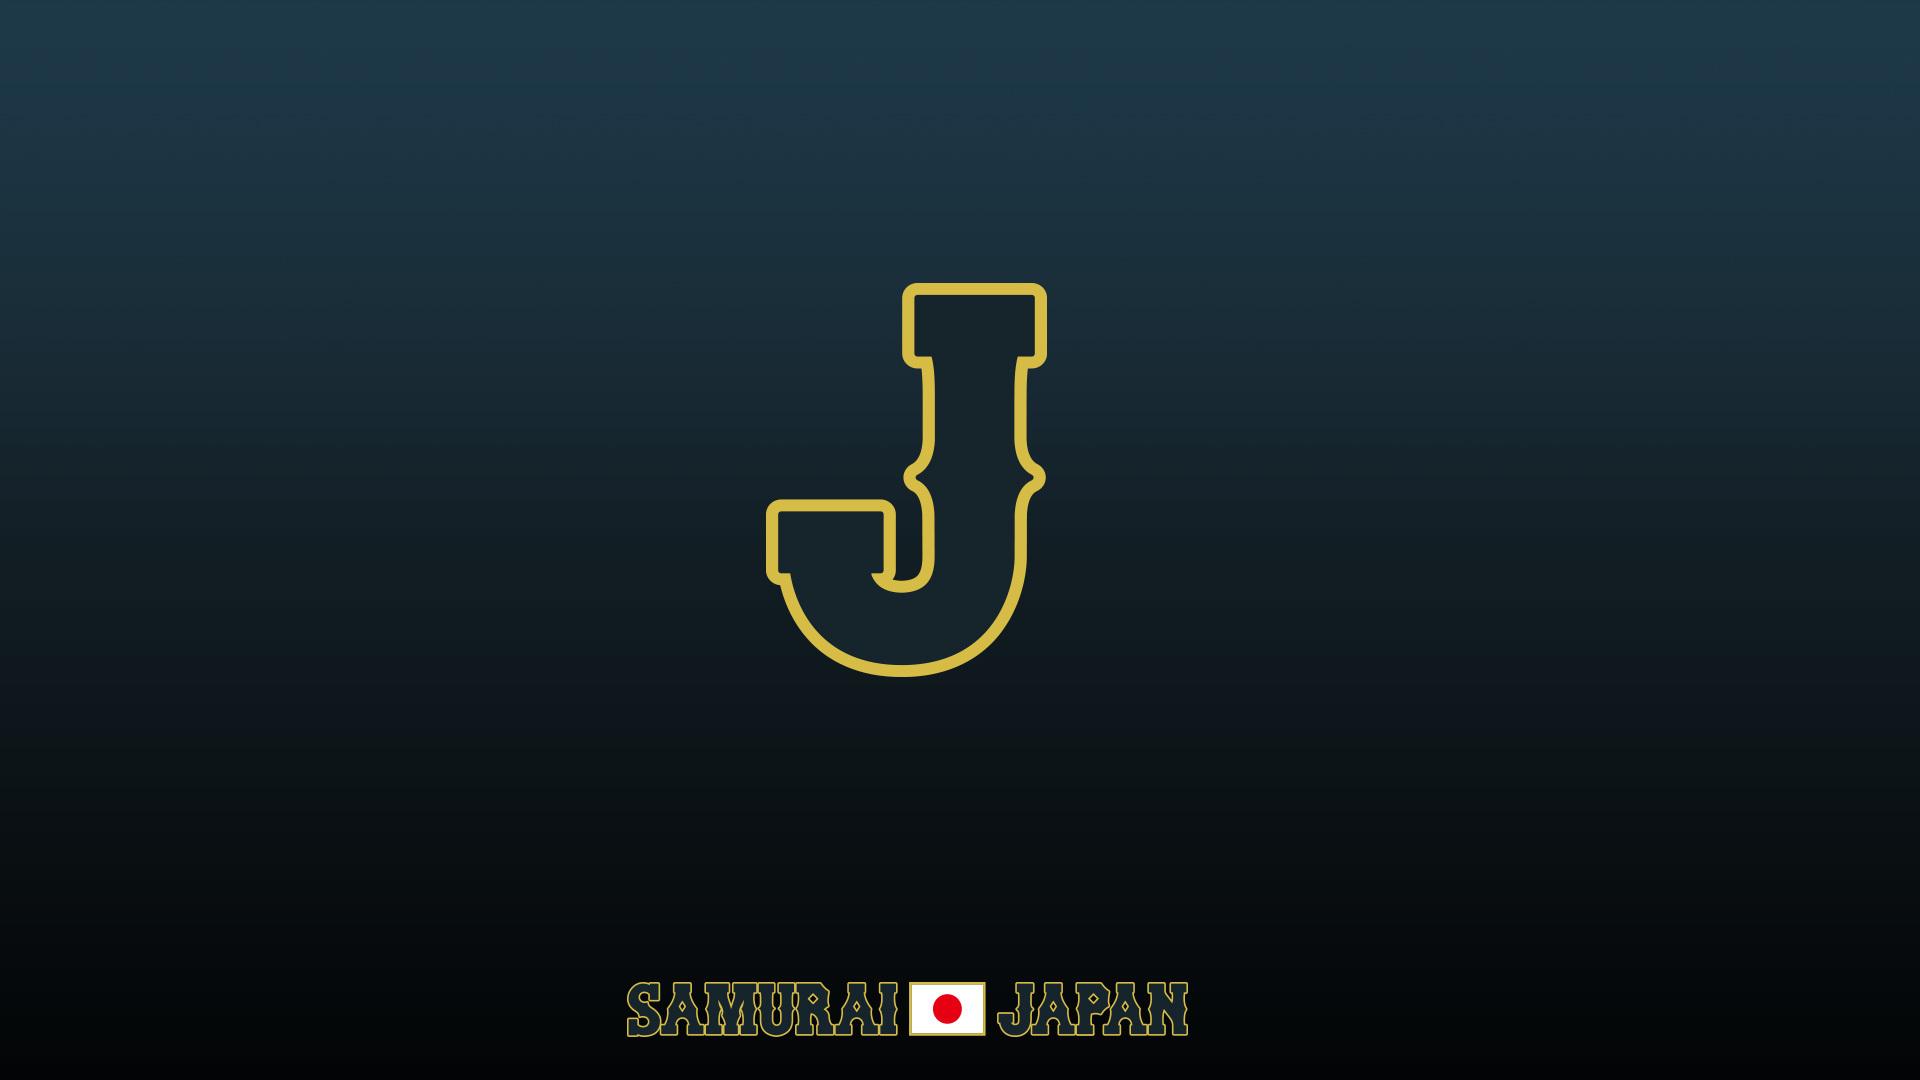 JJJ.jpg